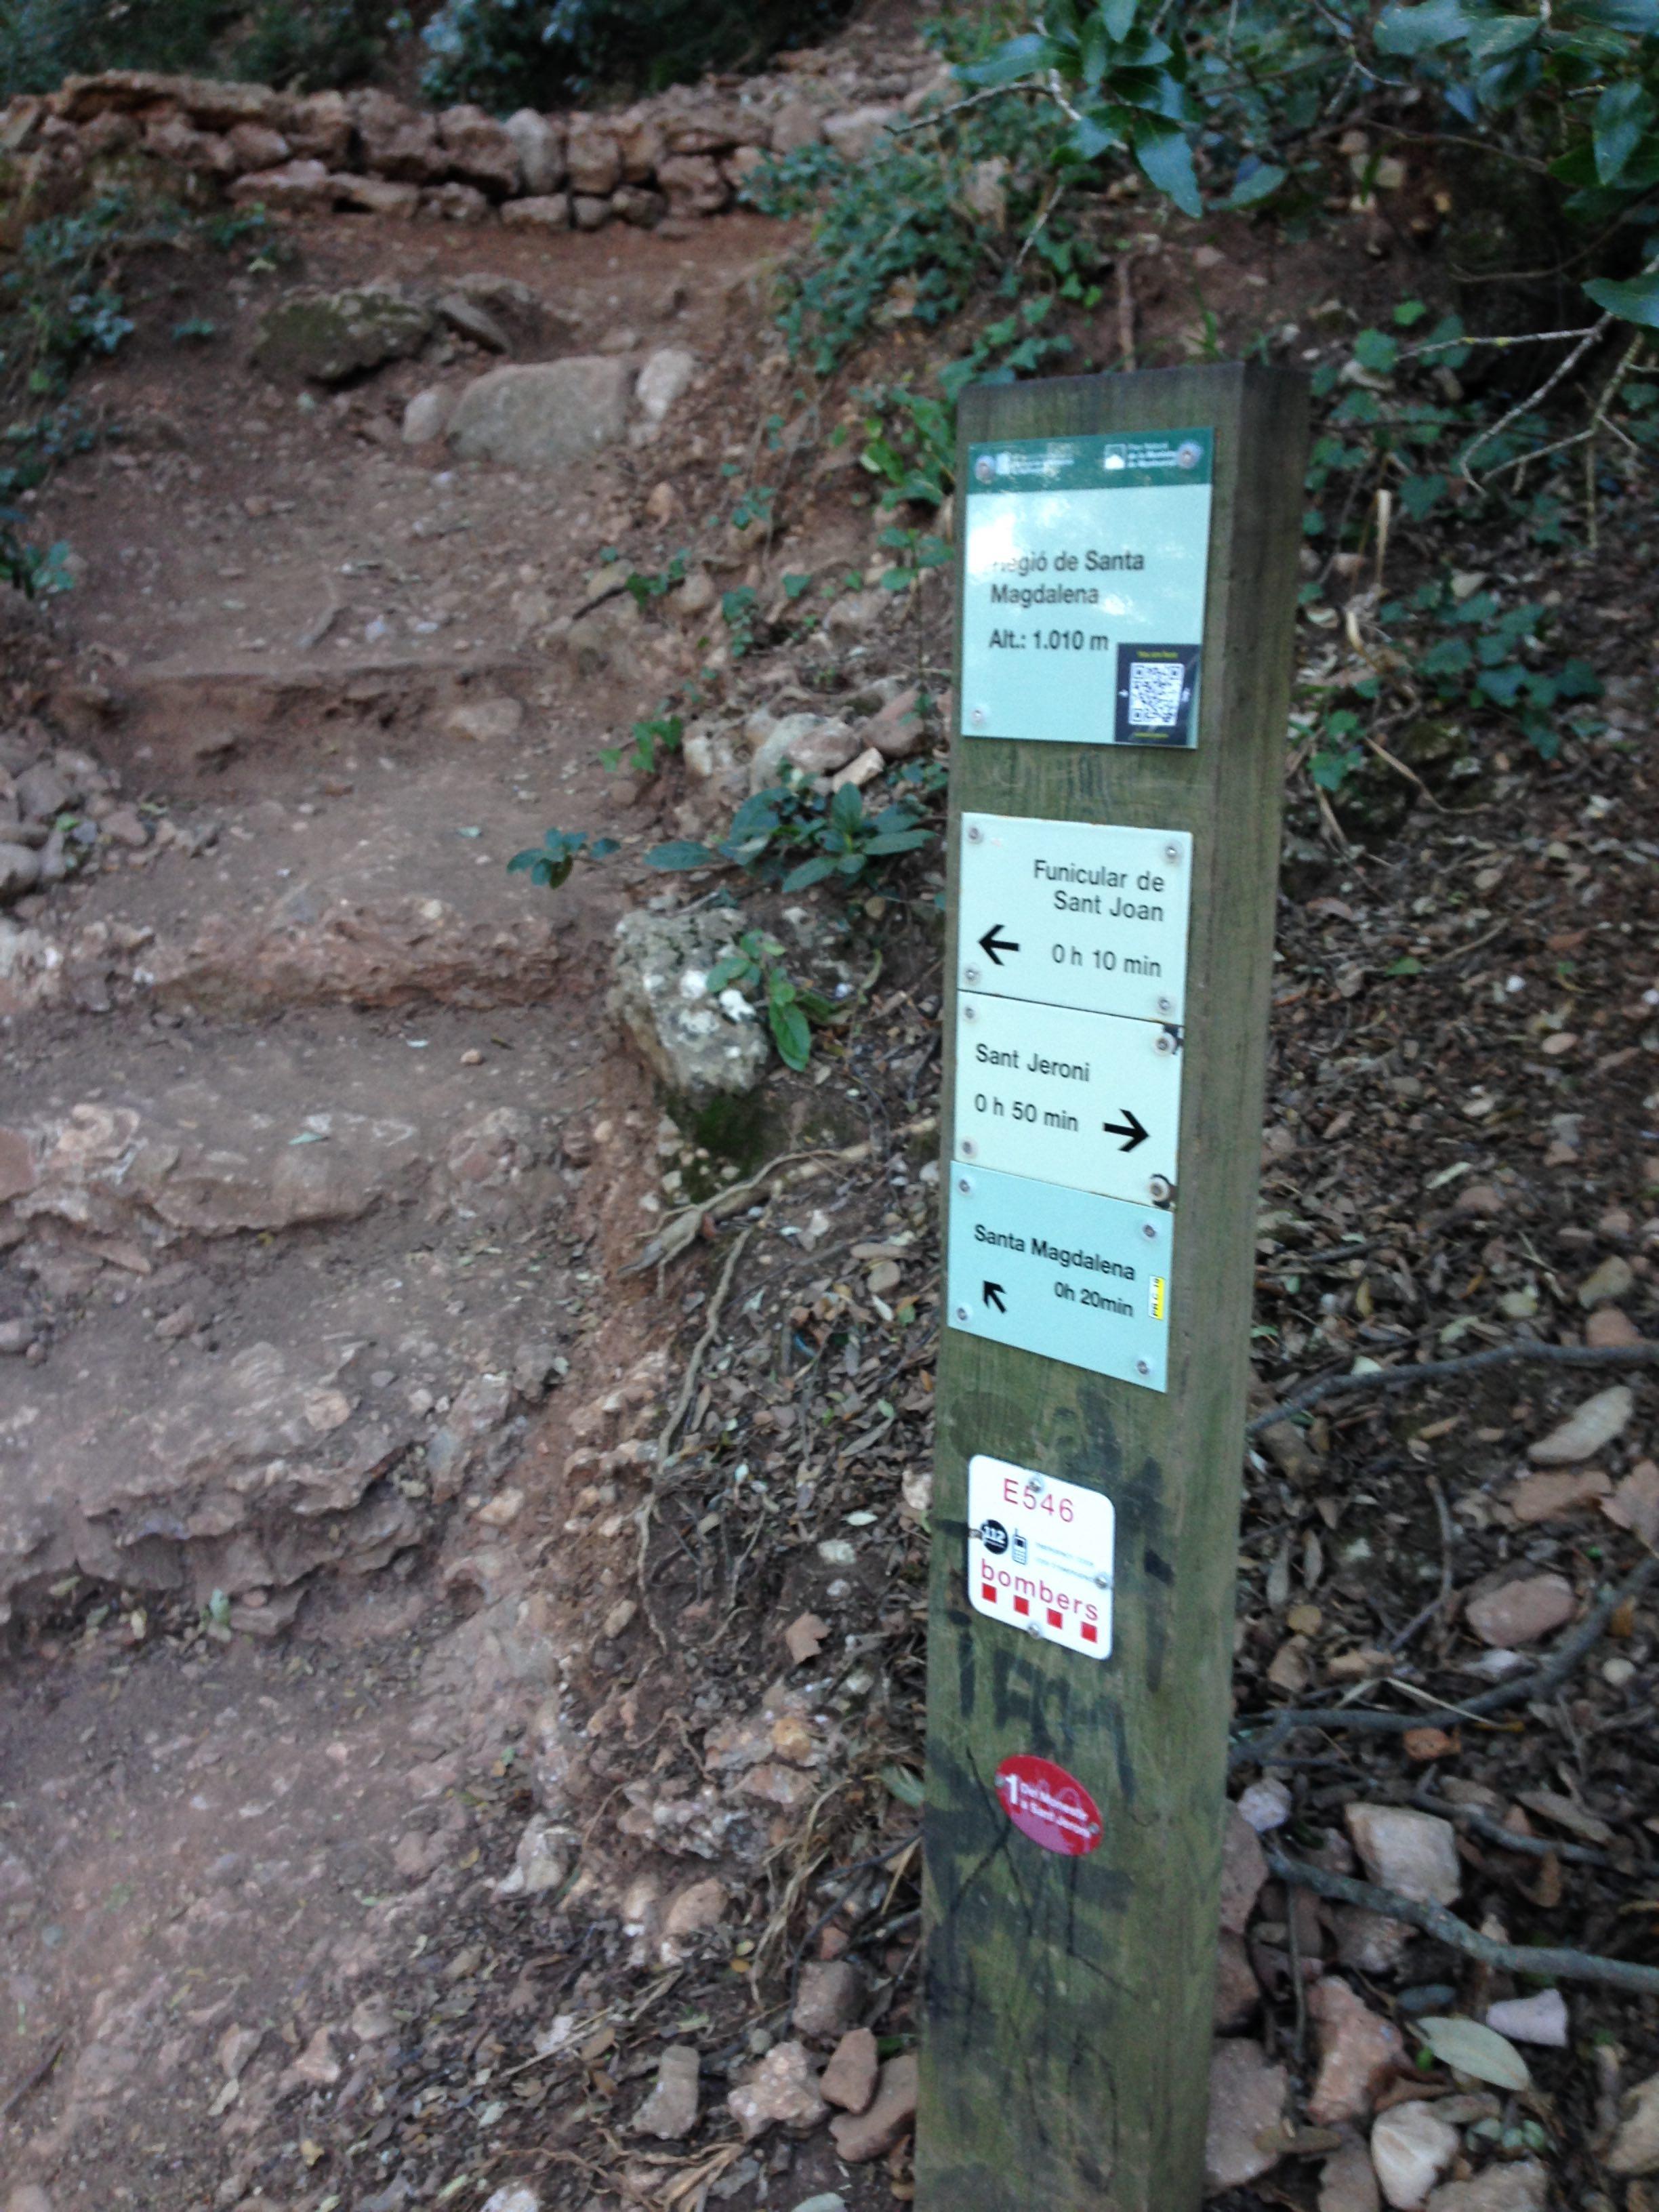 Trail sign in Montserrat Natural Park - photo by Julie Dodd